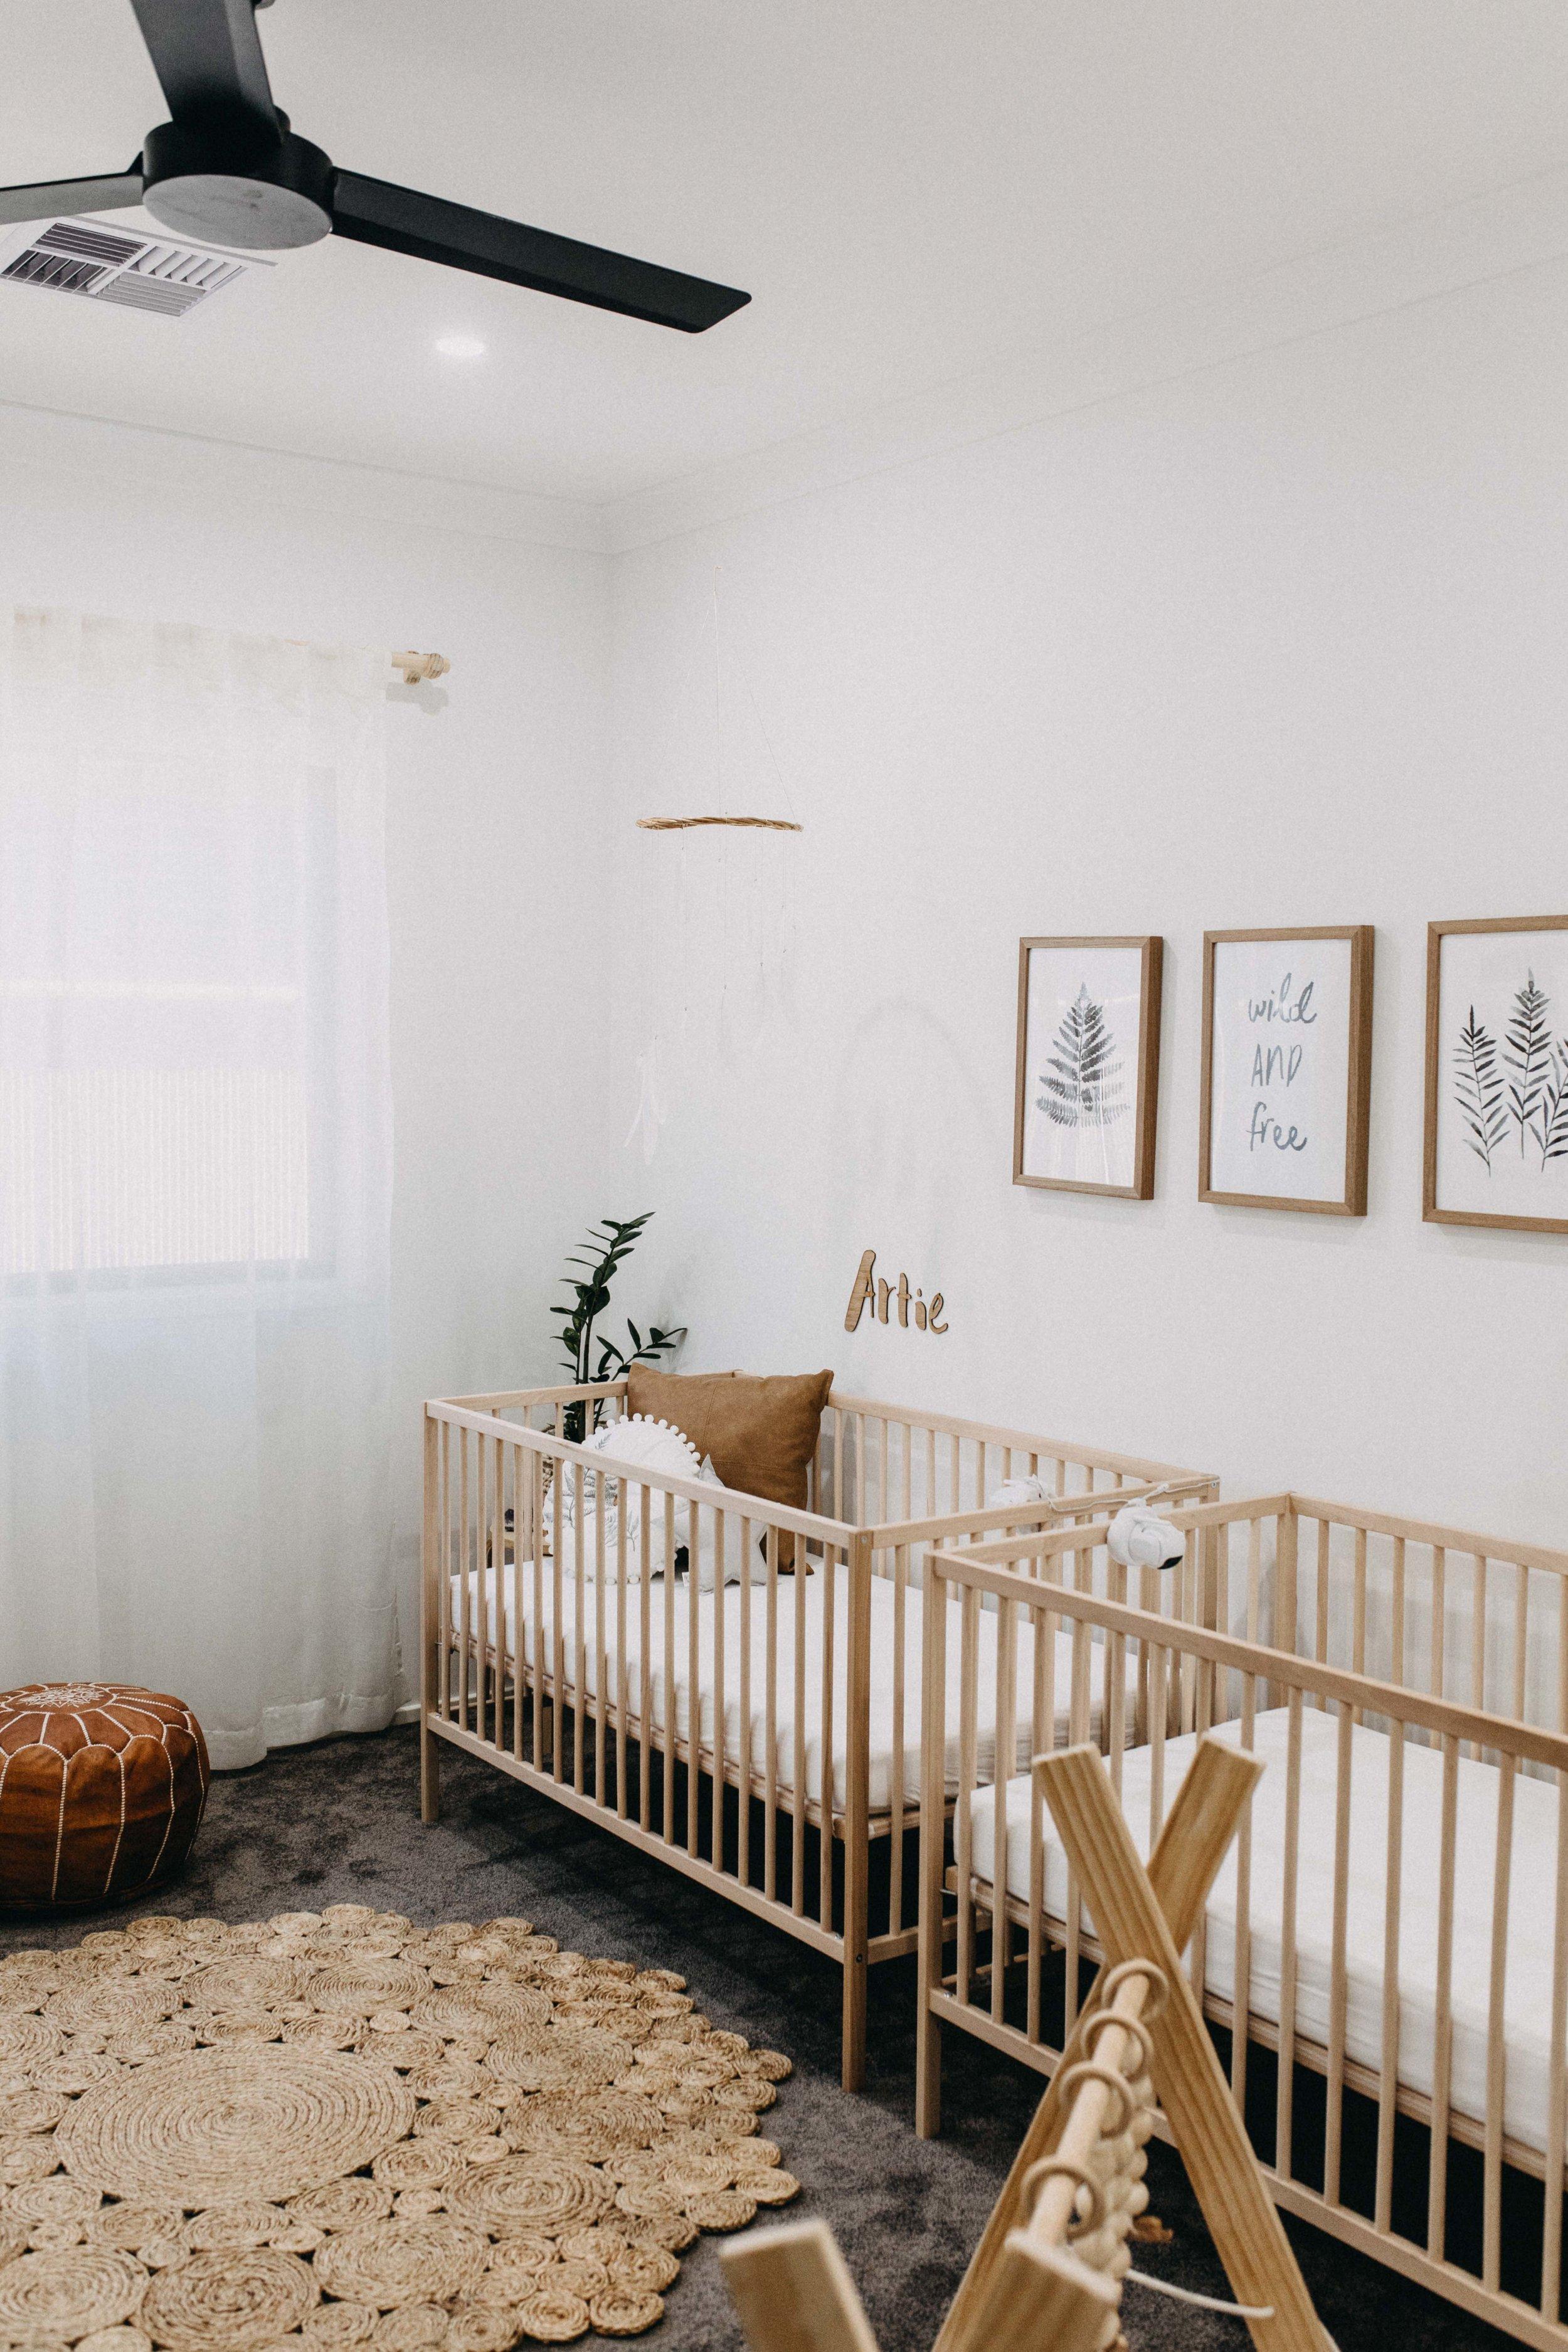 twin-newborn-photography-camden-macarthur-5.jpg